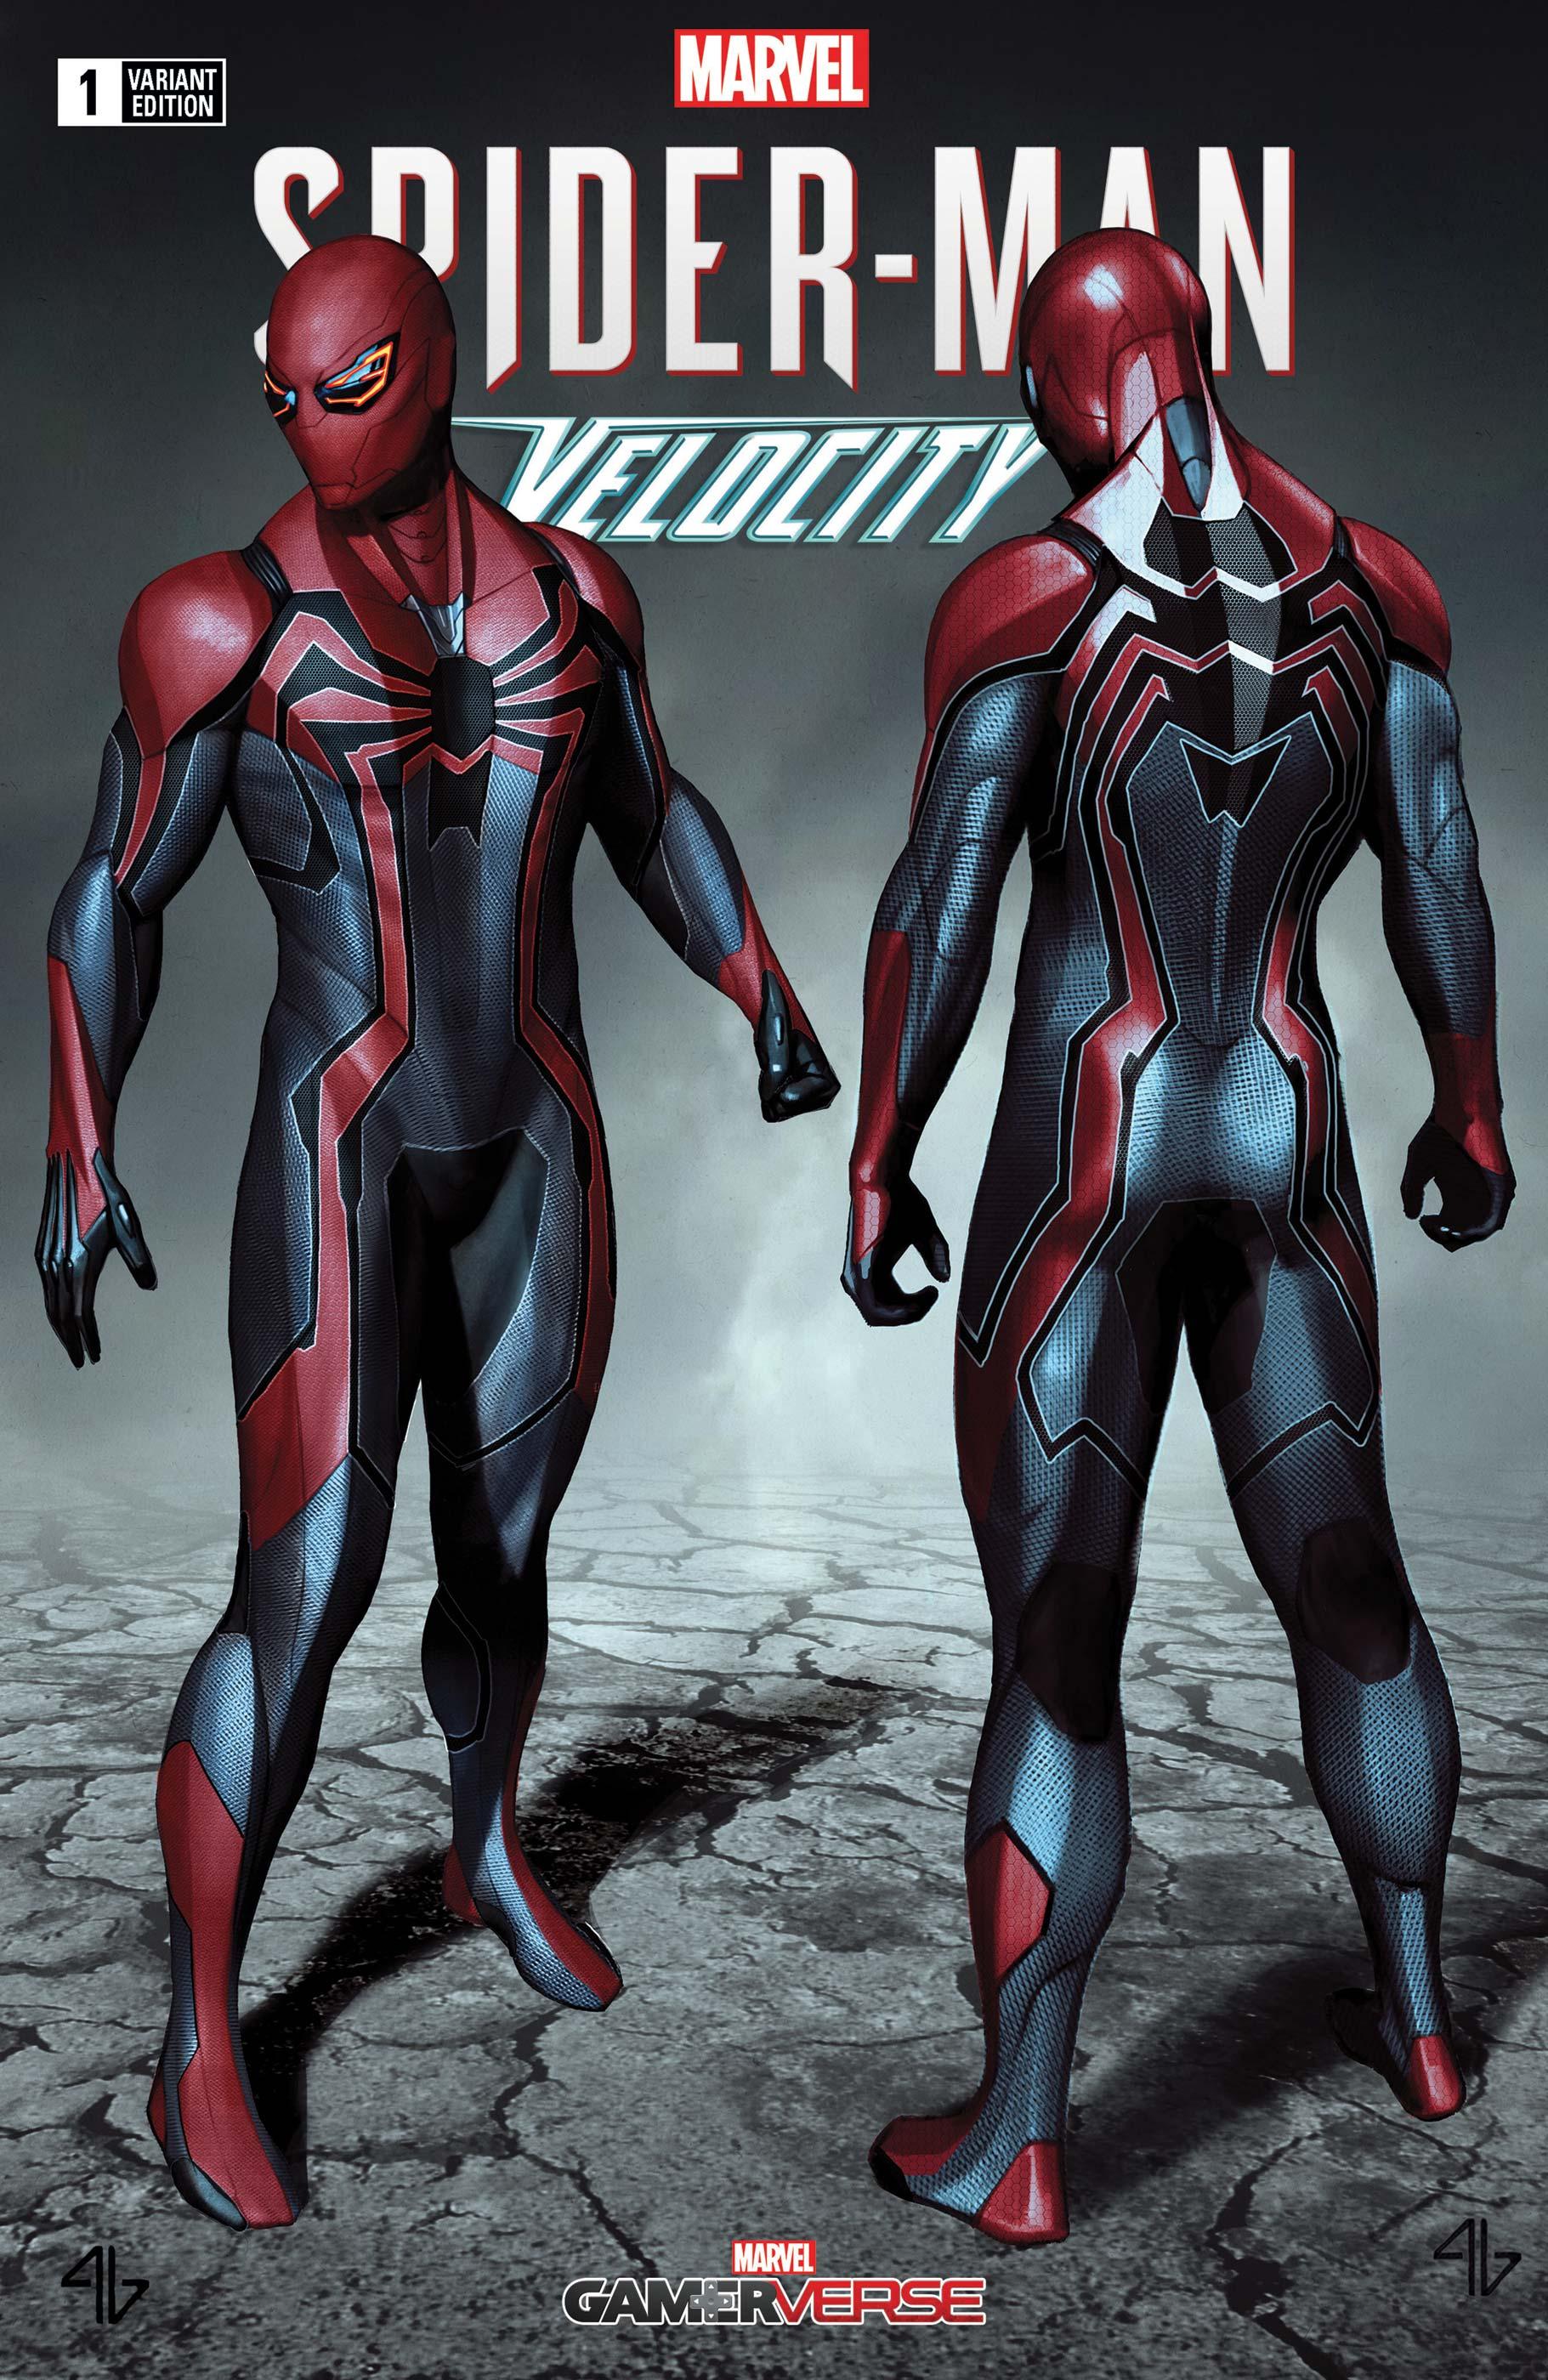 Marvel's Spider-Man: Velocity (2019) #1 (Variant)